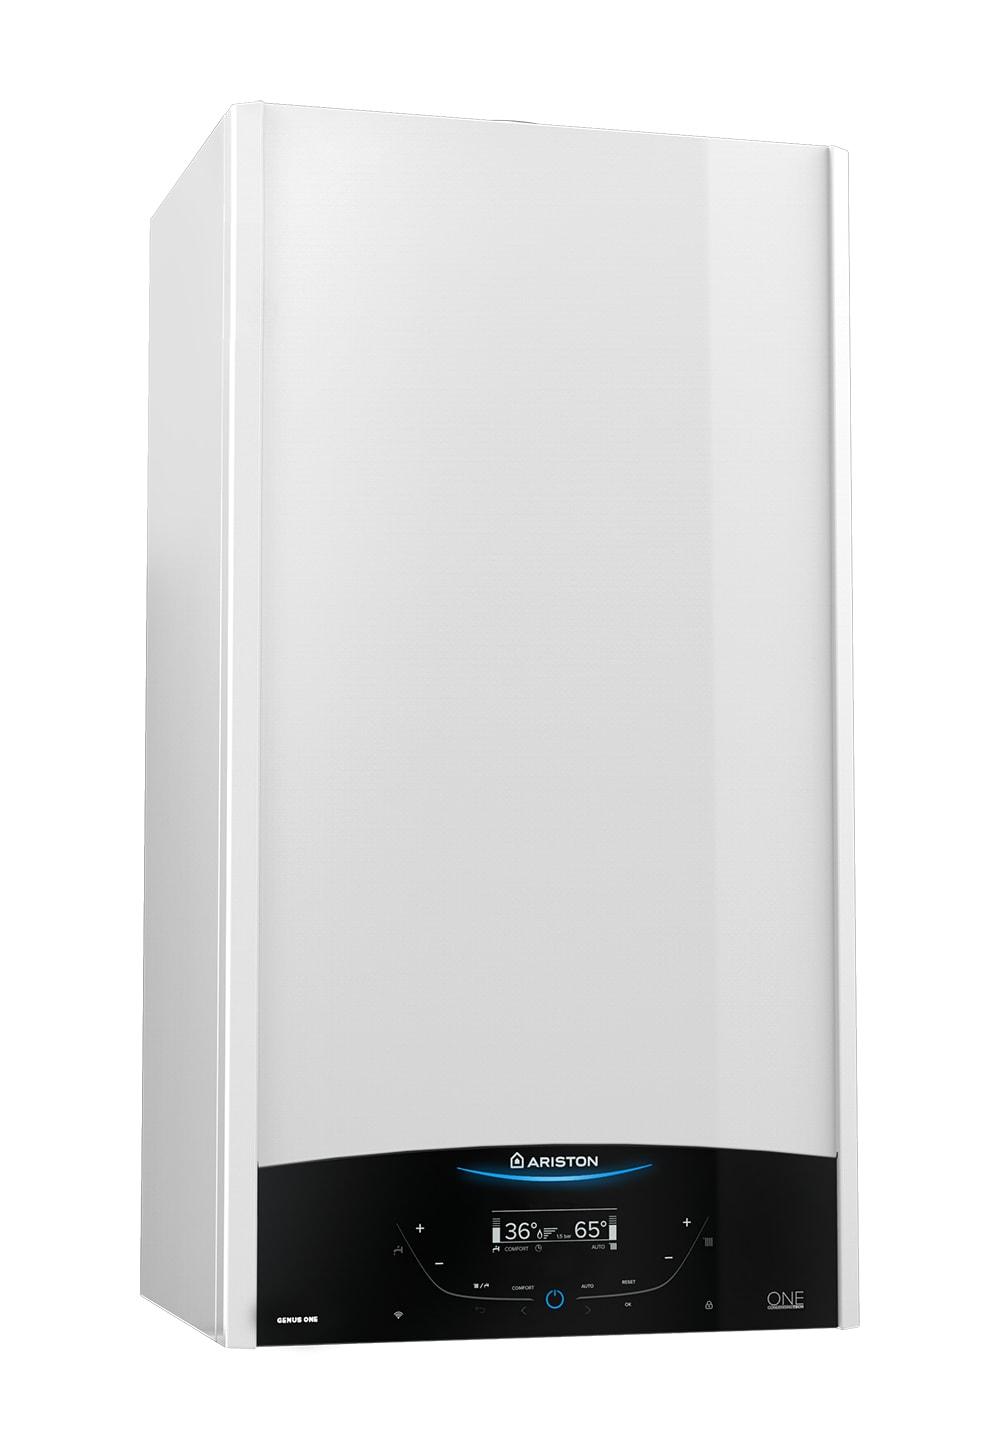 Centrala termica in condensare Ariston GENUS ONE SYSTEM 35, capacitate 35 kW, afisaj LCD, doar incalzire, Functie AUTO, Silentioasa